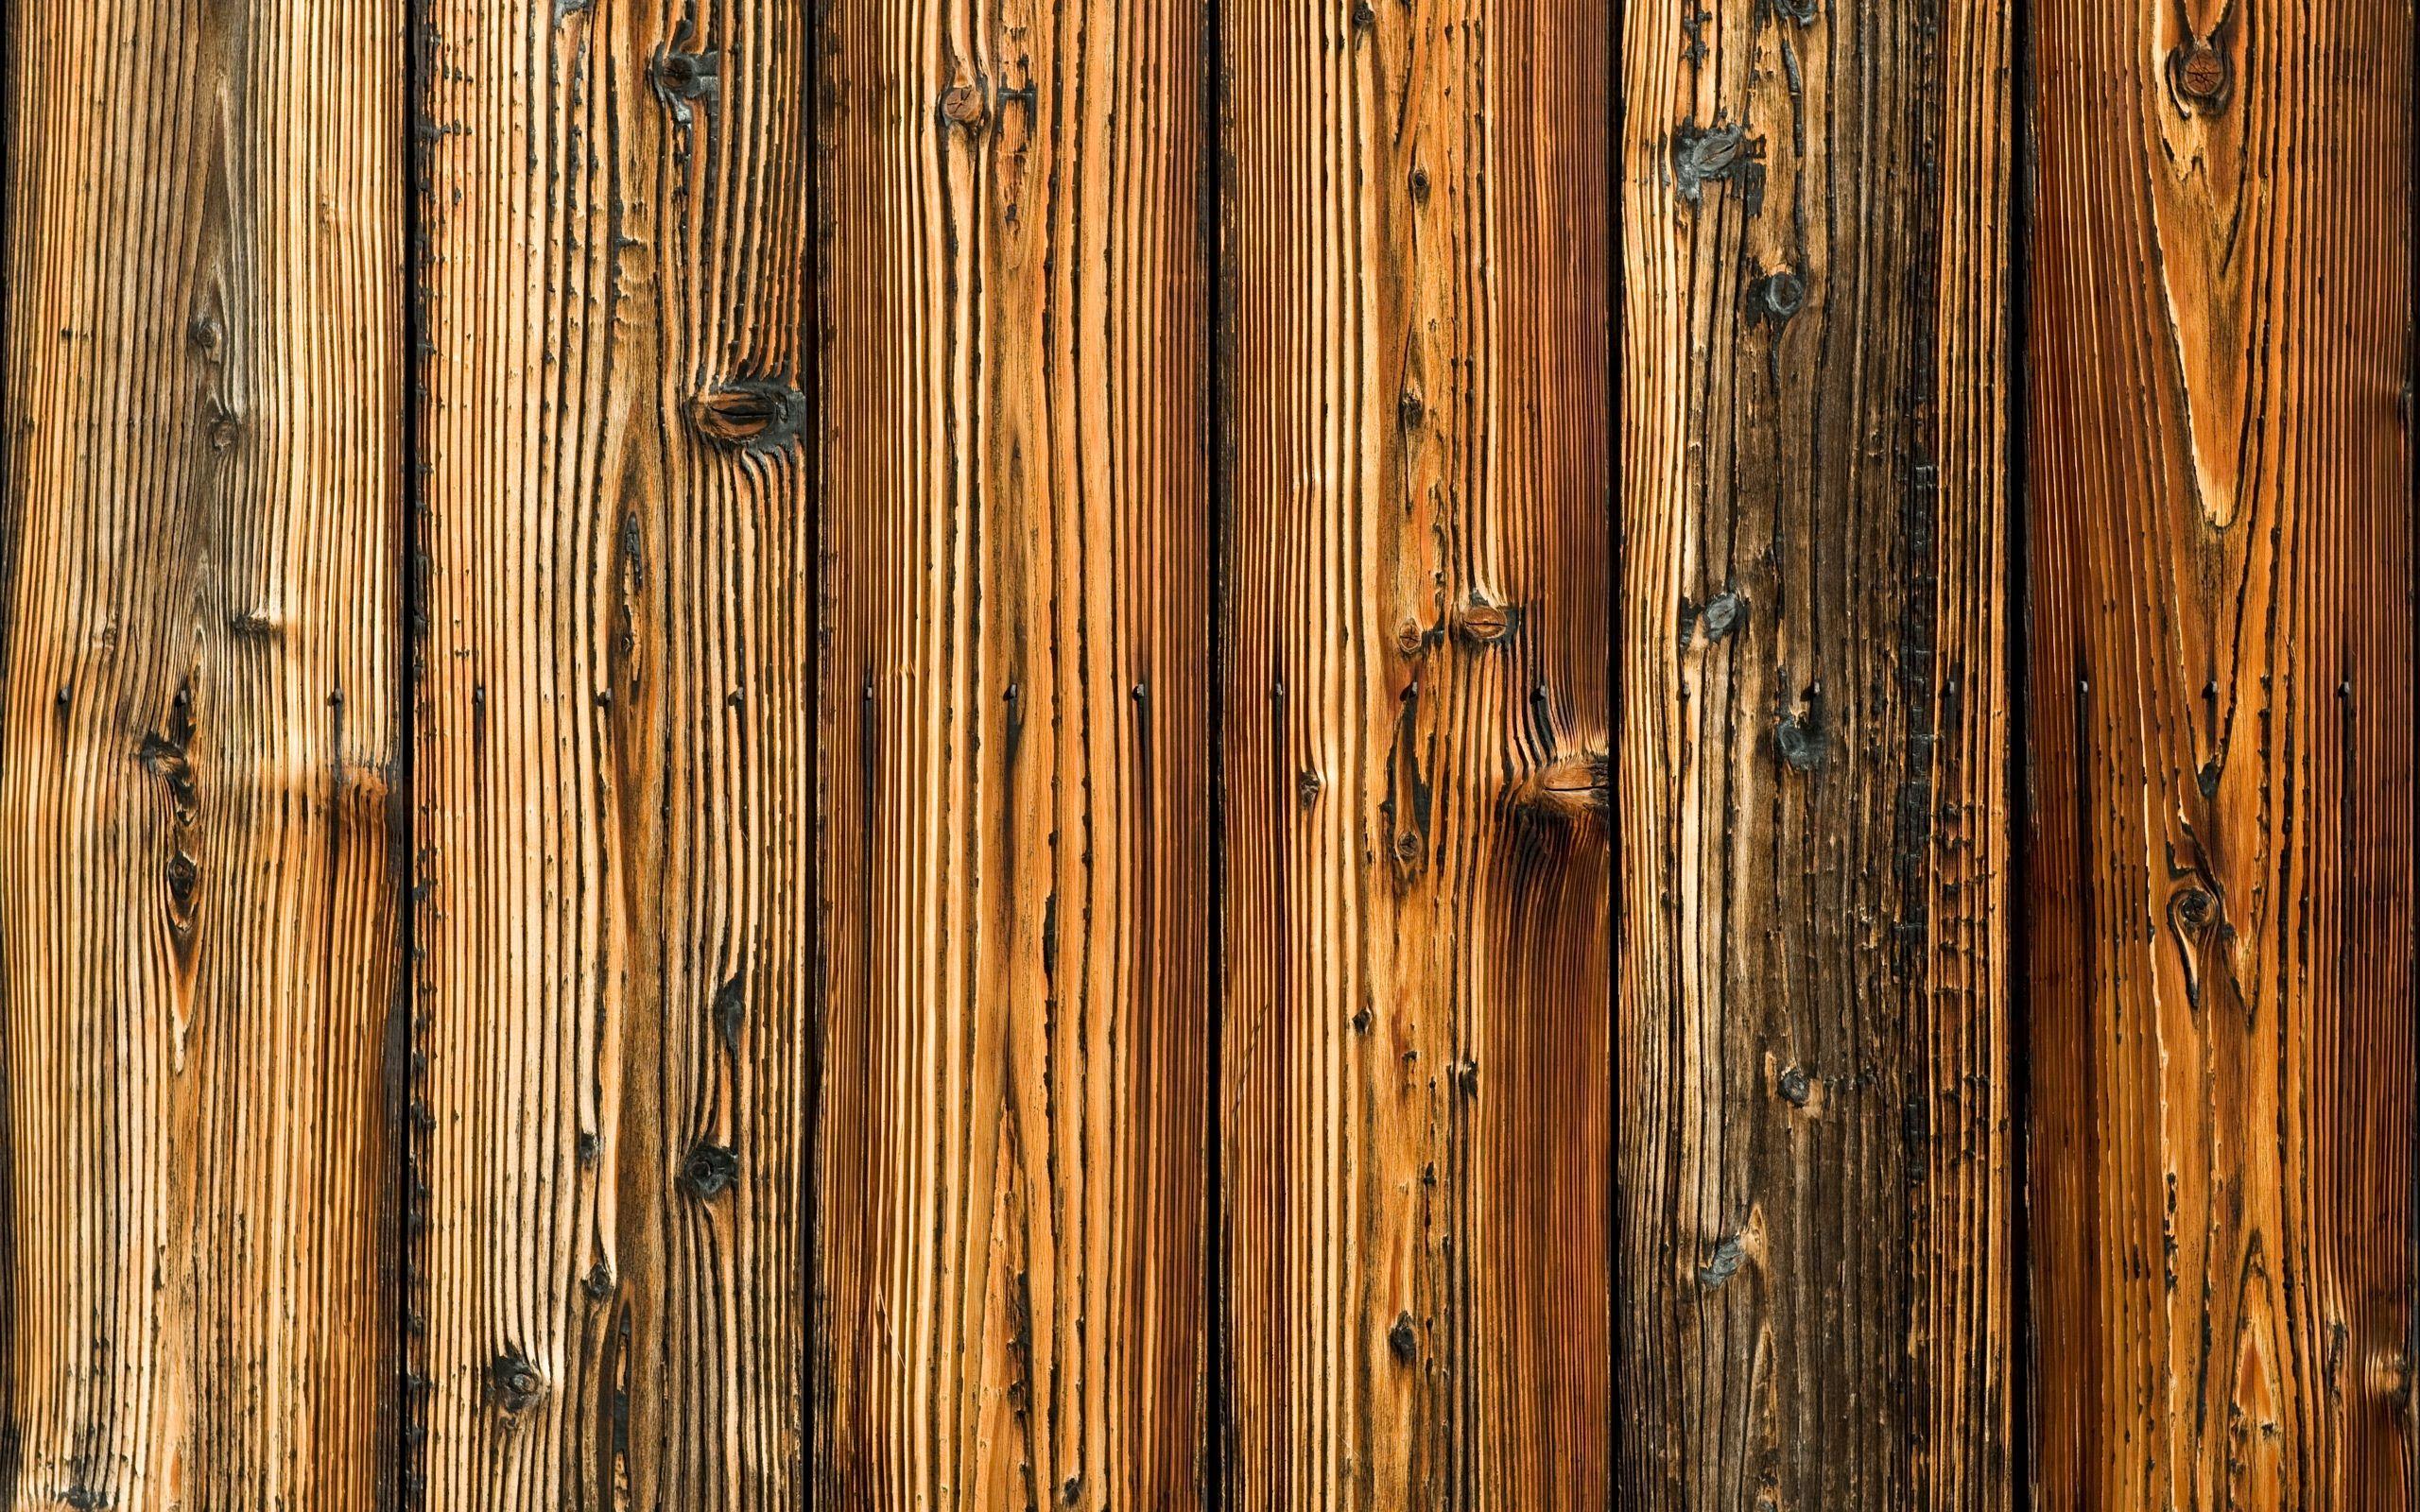 Http Www Hdwallsource Com Wood Wallpaper Wood Grain Wallpaper Wood Floor Texture